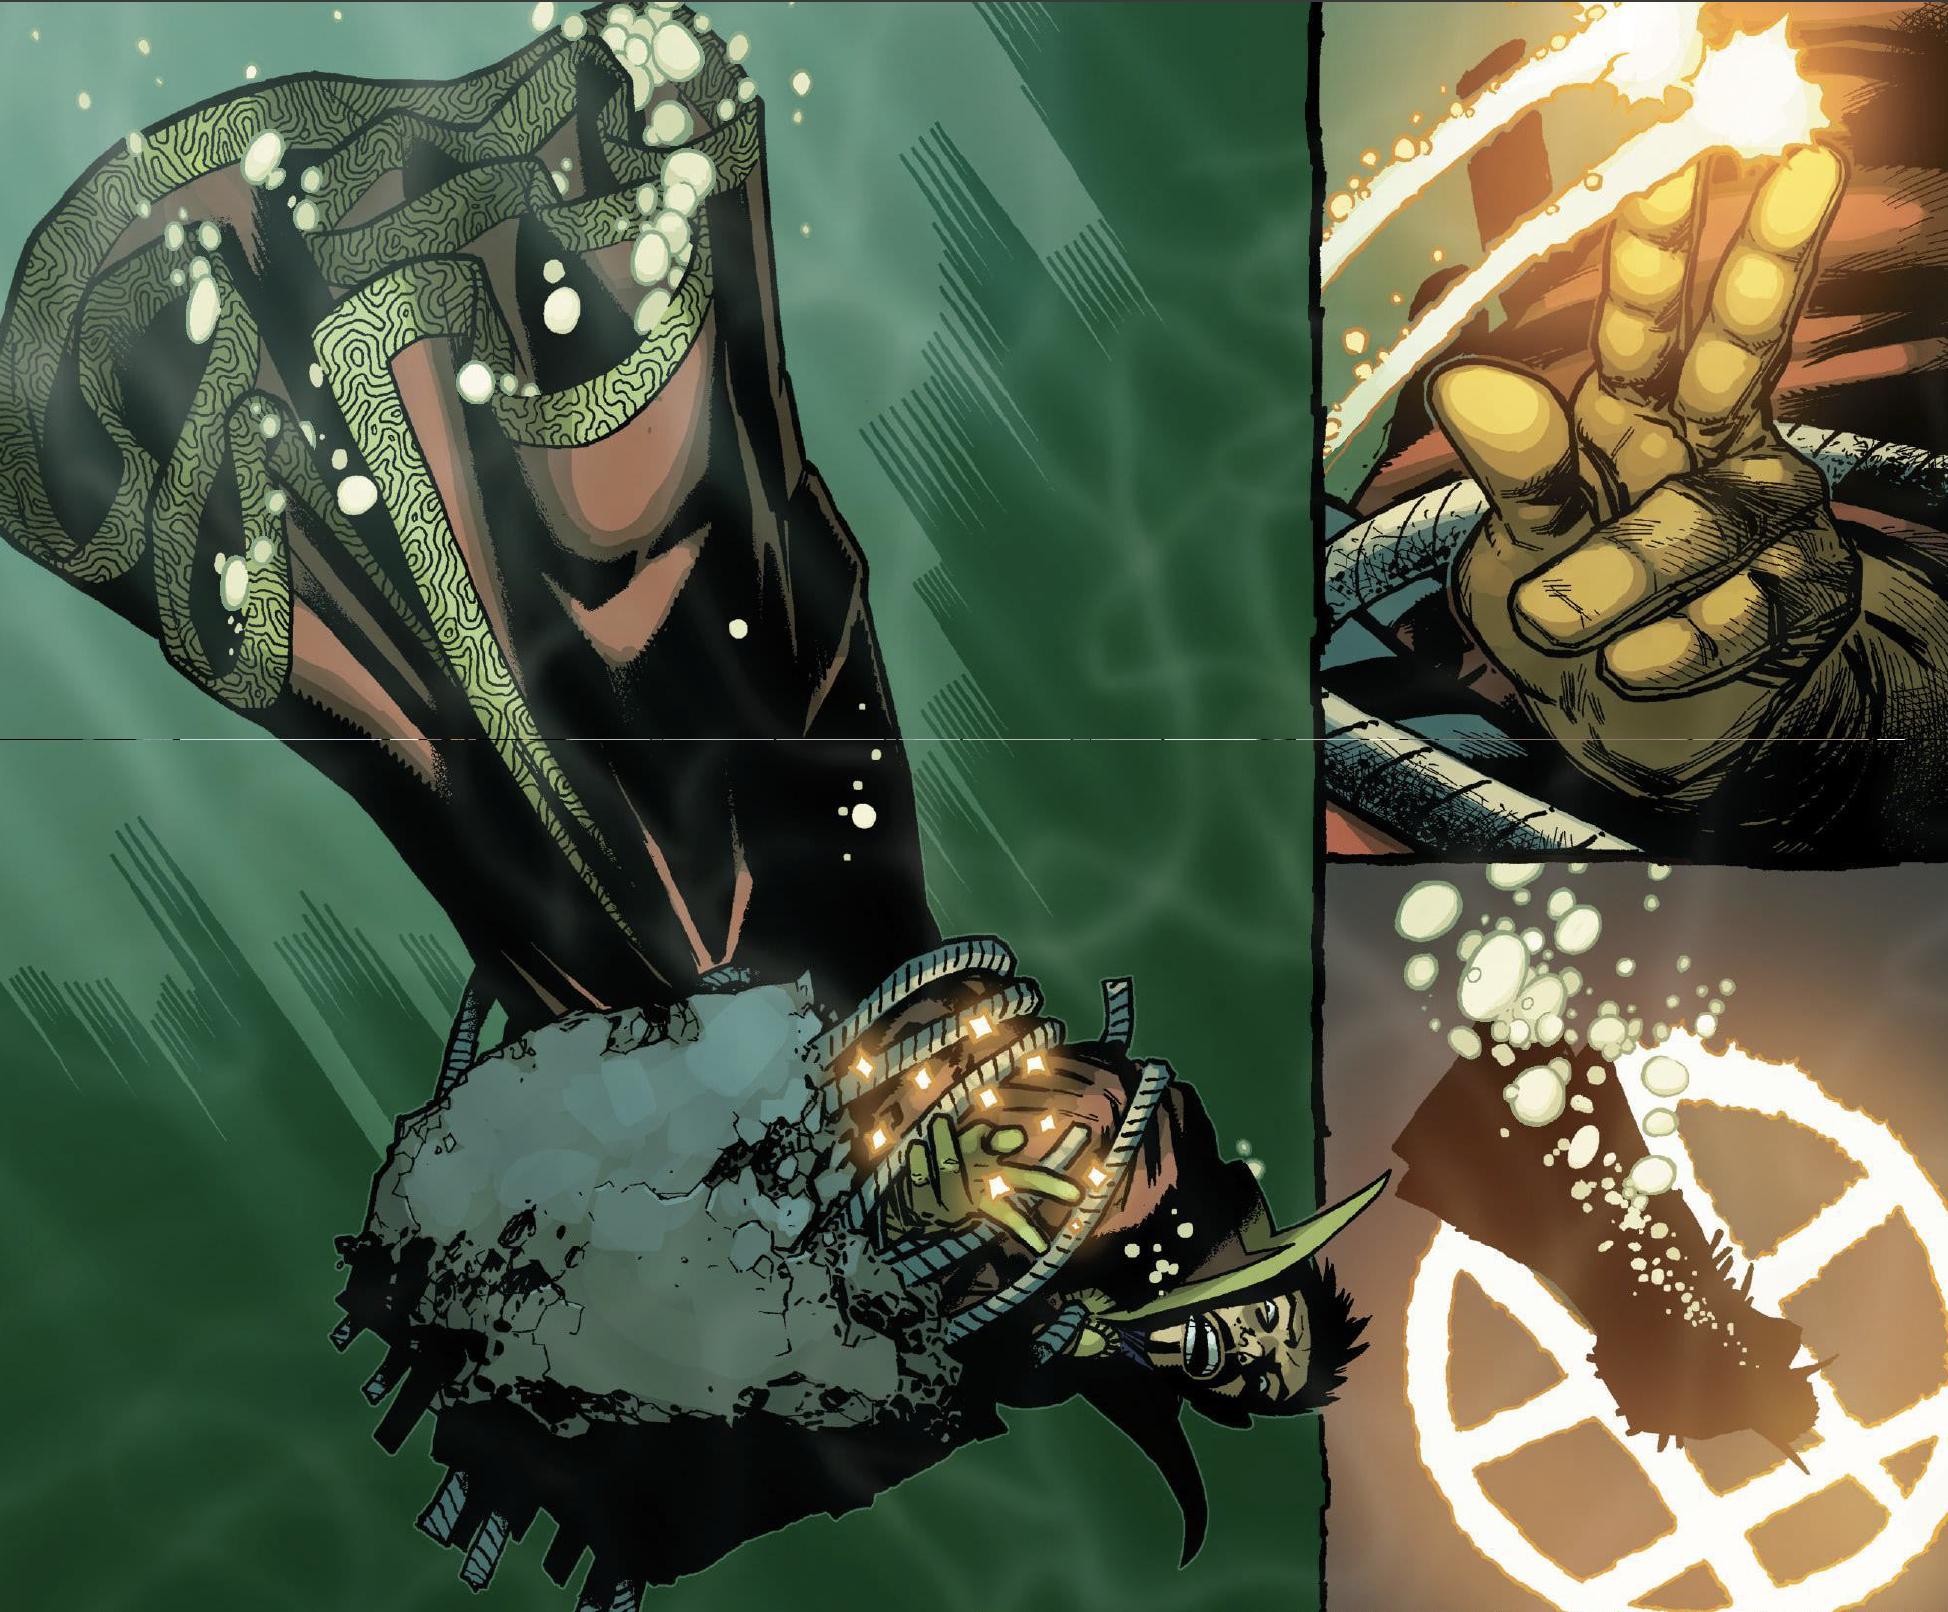 Page 3 of Dr. Strange: Surgeon Supreme #2